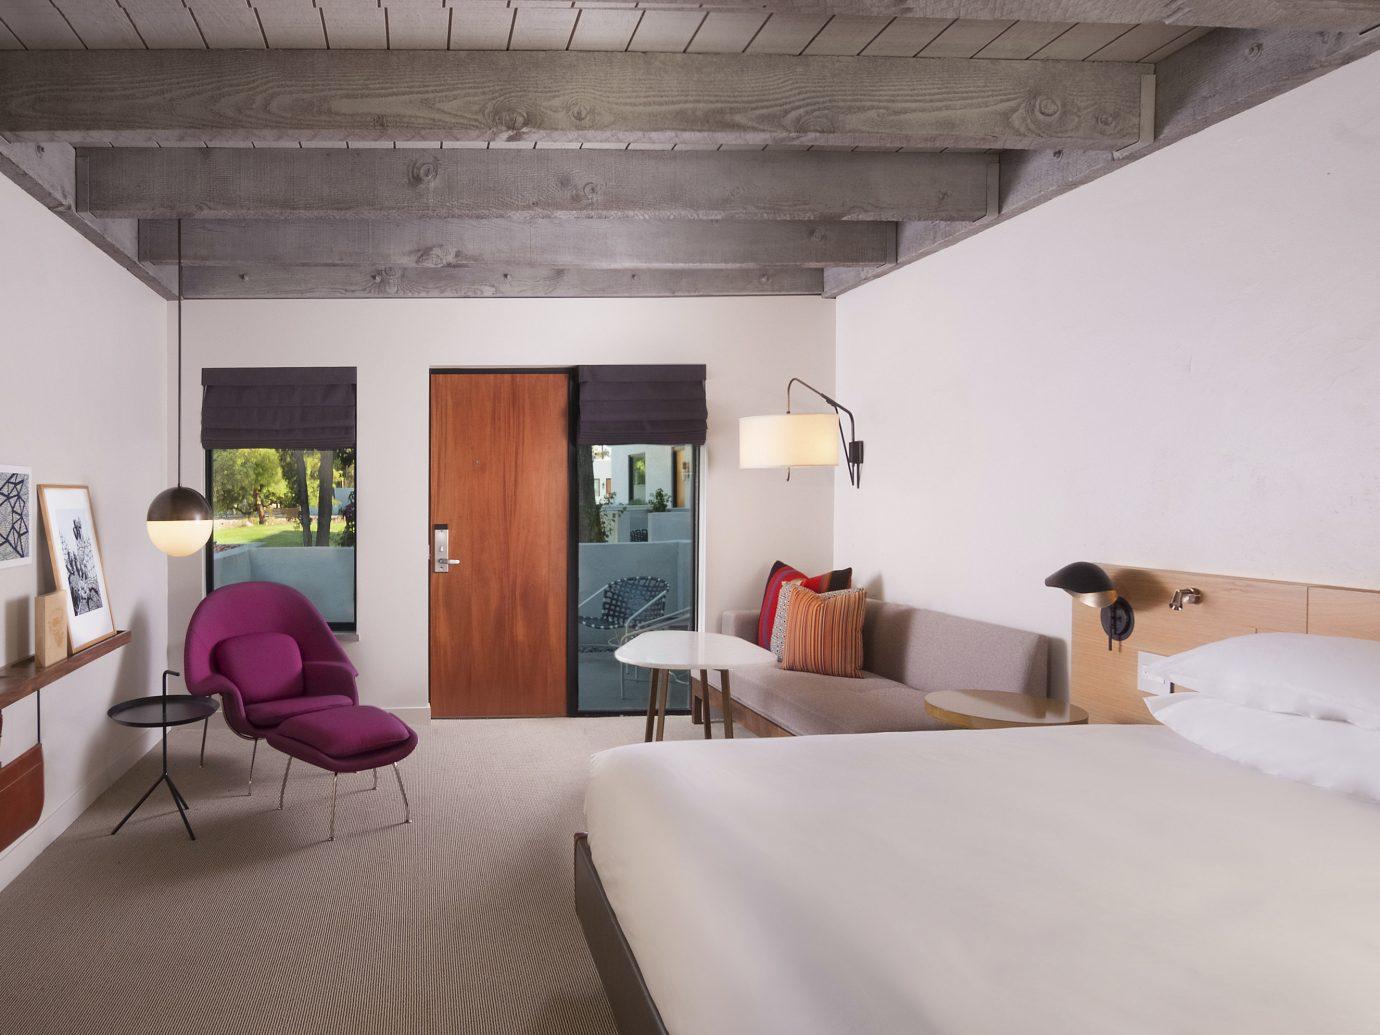 Trip Ideas indoor wall ceiling bed room floor property building Bedroom real estate estate interior design cottage Design Suite Villa loft apartment area furniture